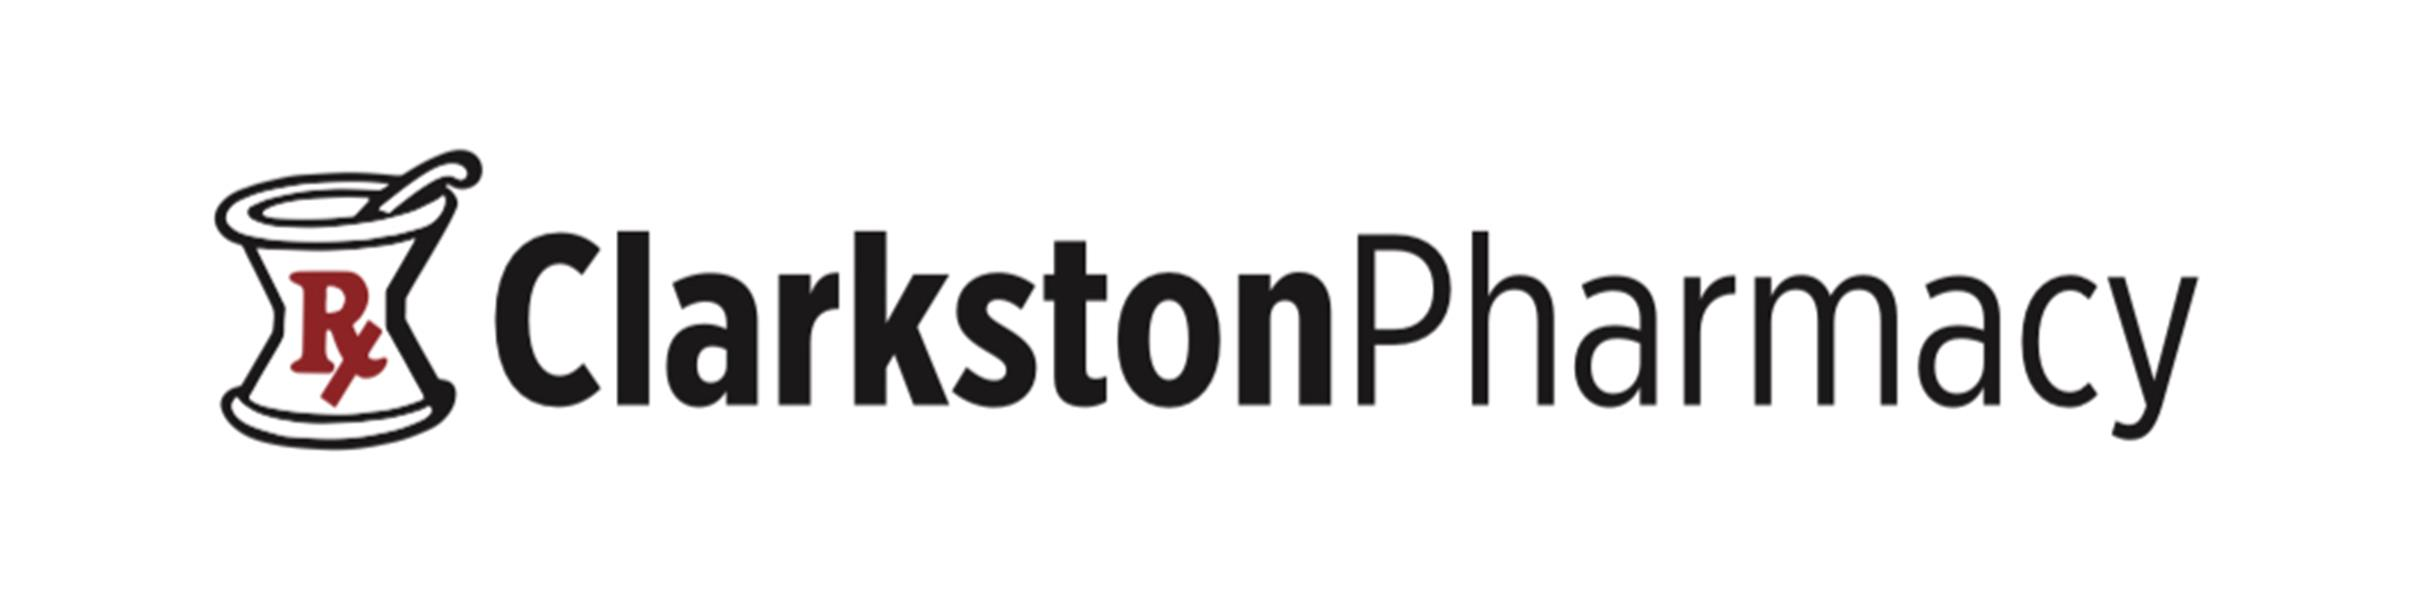 Clarkston Pharmacy